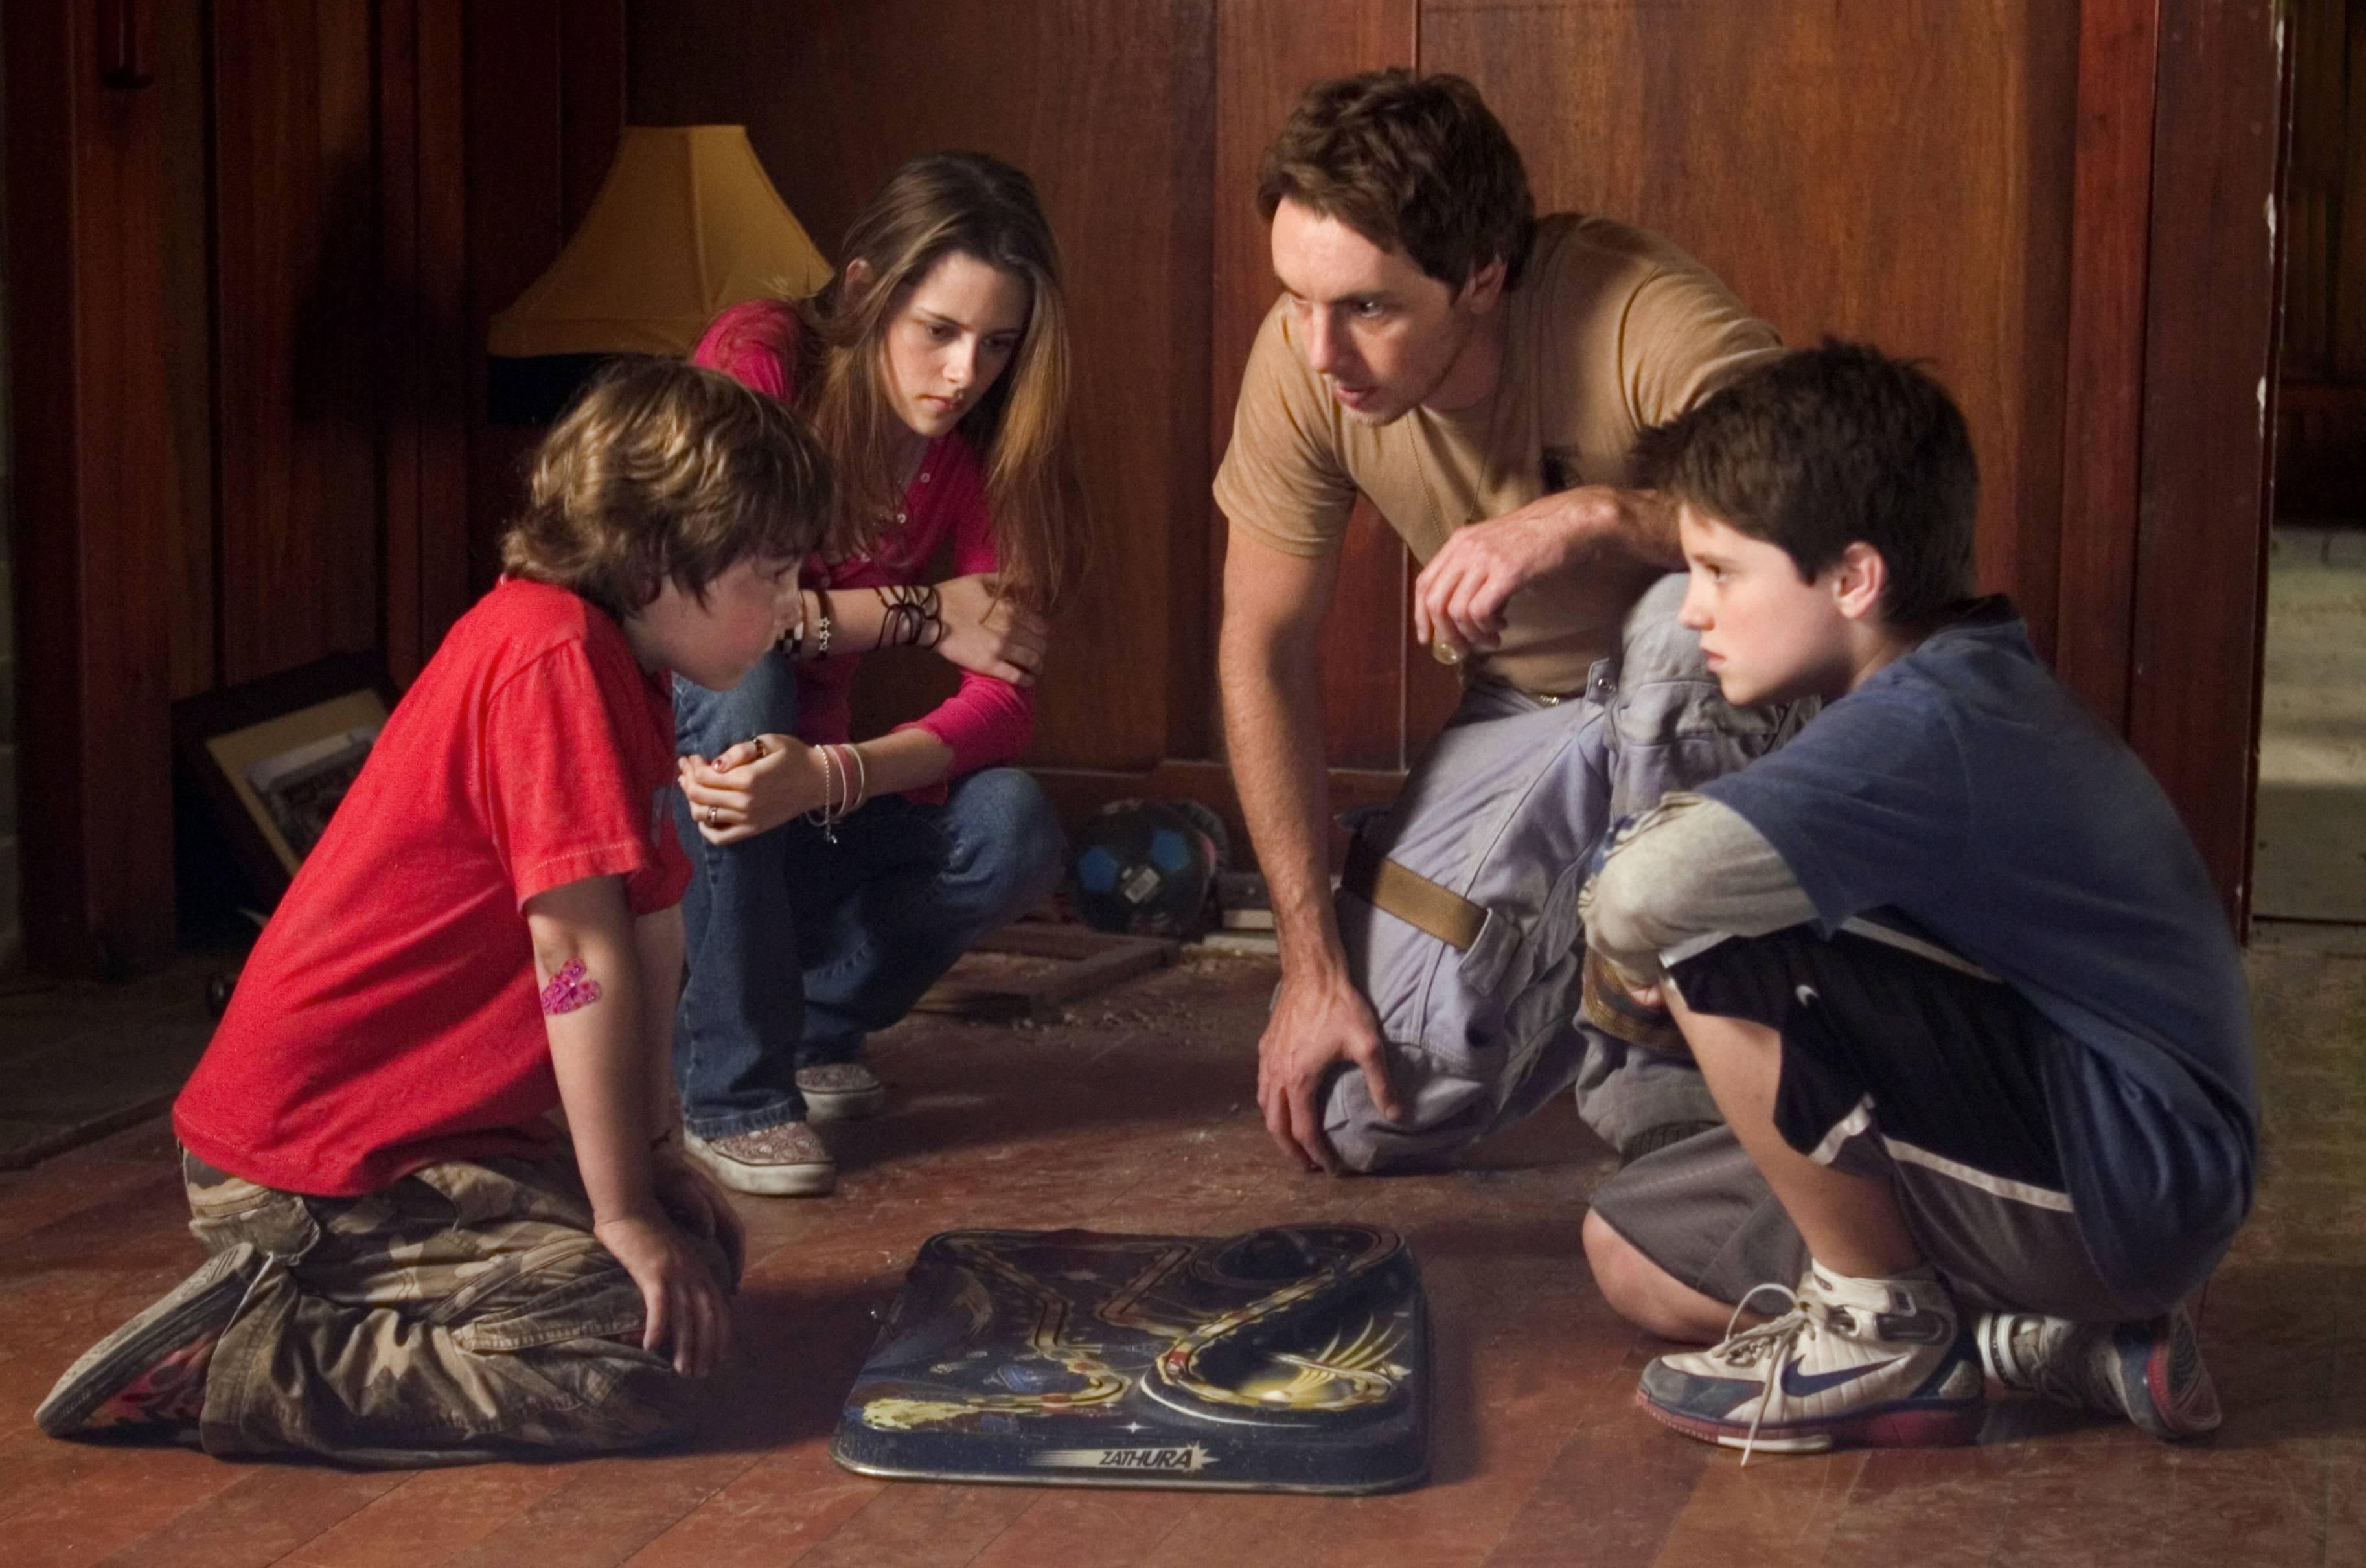 DF-07014_rÐ (l to r) Jonah Bobo, Kristen Stewart, Dax Shepard and Josh Hutcherson star in Columbia PicturesÕ sci-fi adventure Zathura. Photo Credit: Merrick Morton